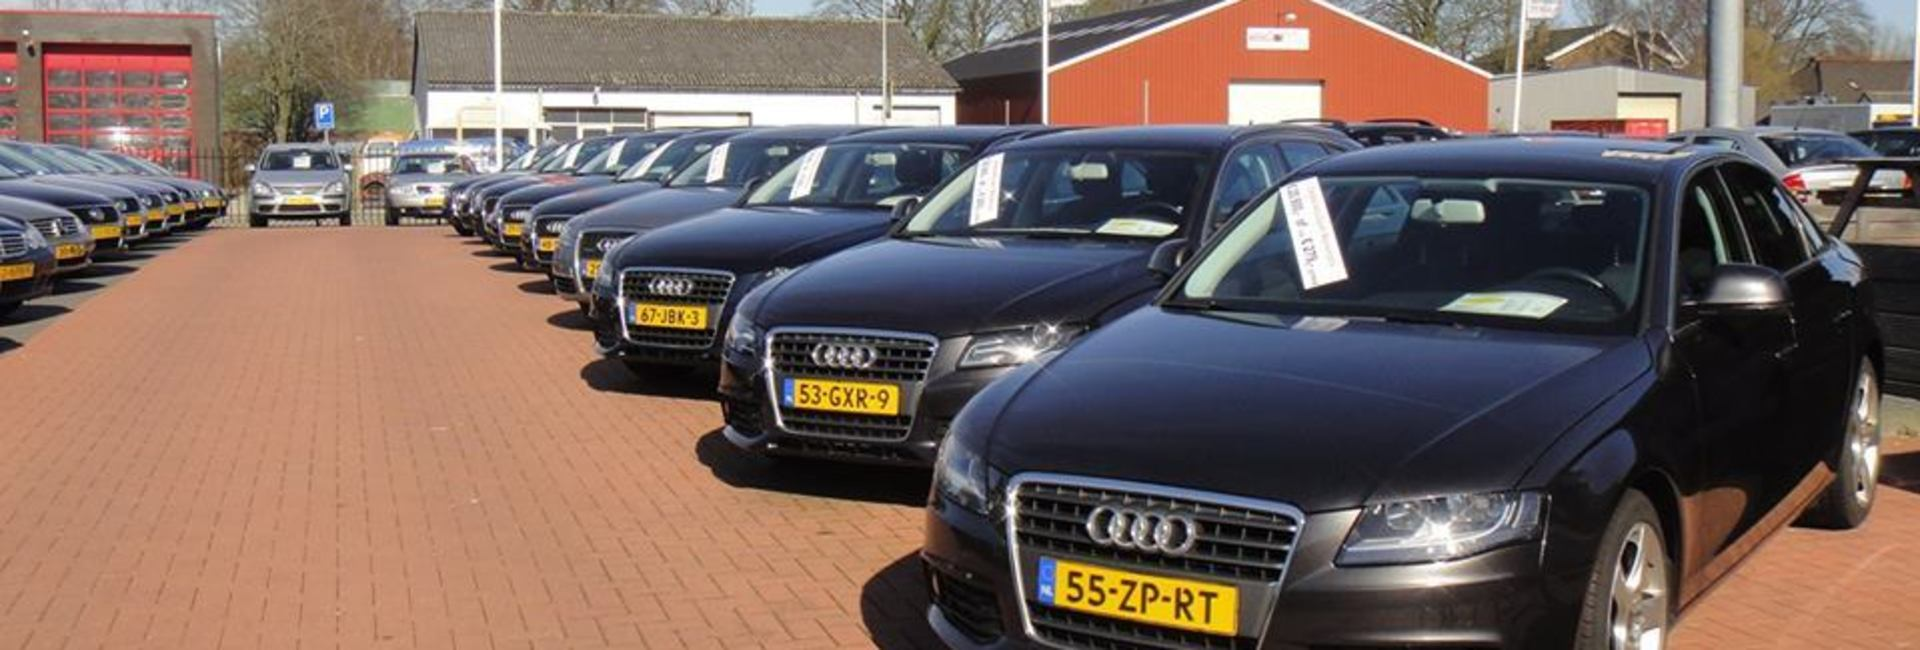 Occasions Nieuwe Pekela Auto Outlet Noord